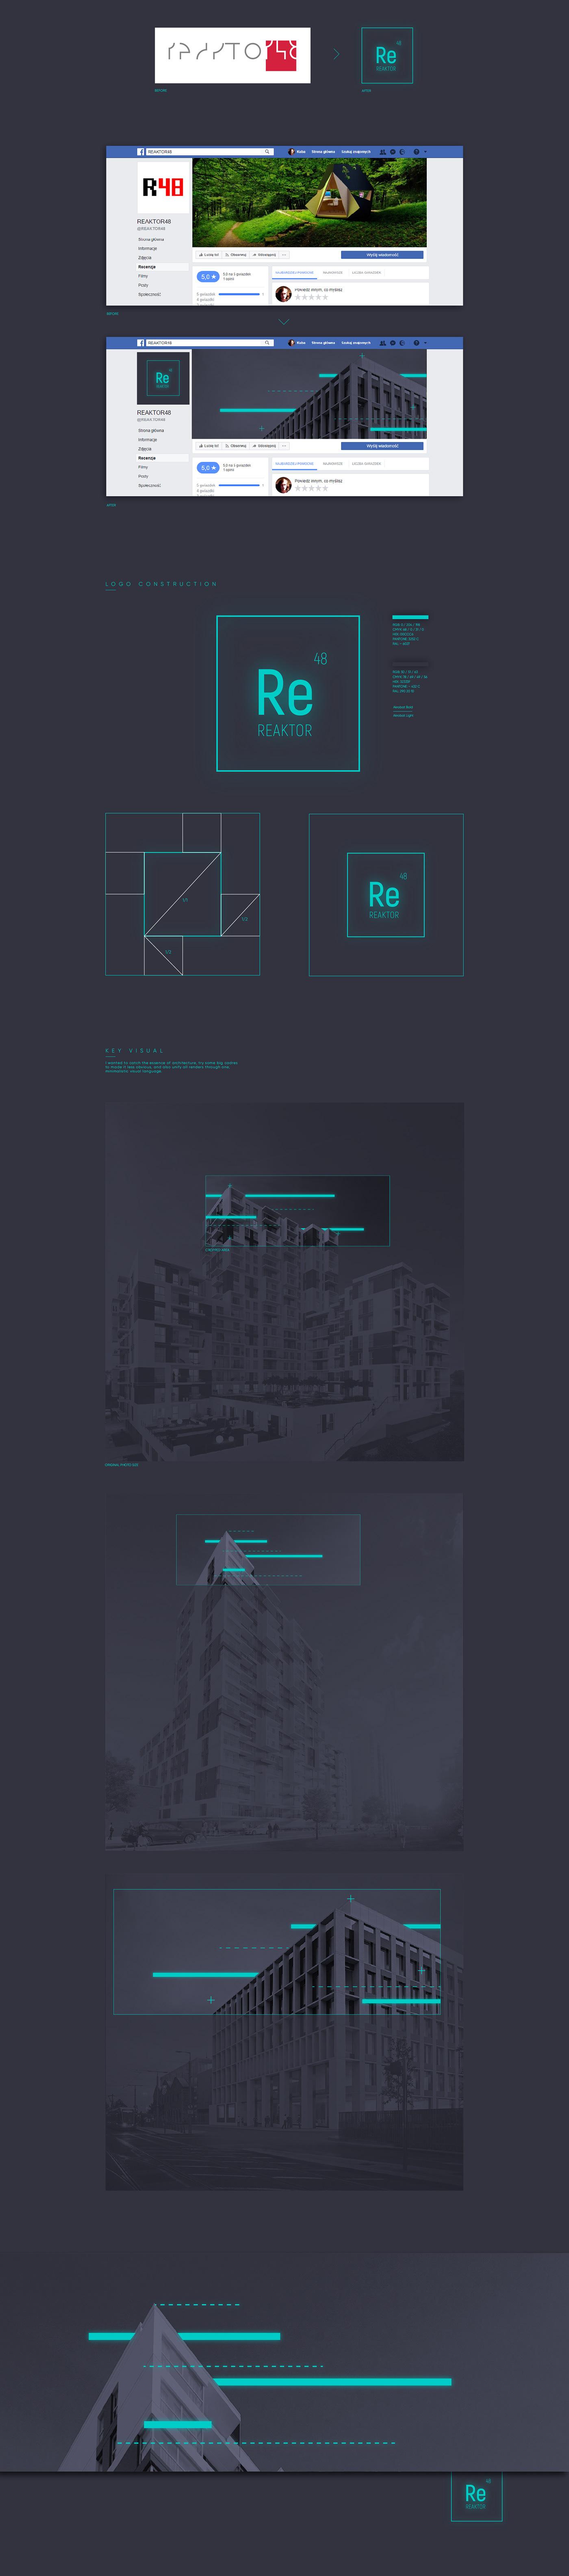 branding ,visual identity,vector,typography  ,minimalistic,logo,graphic,architecture,brand,poland